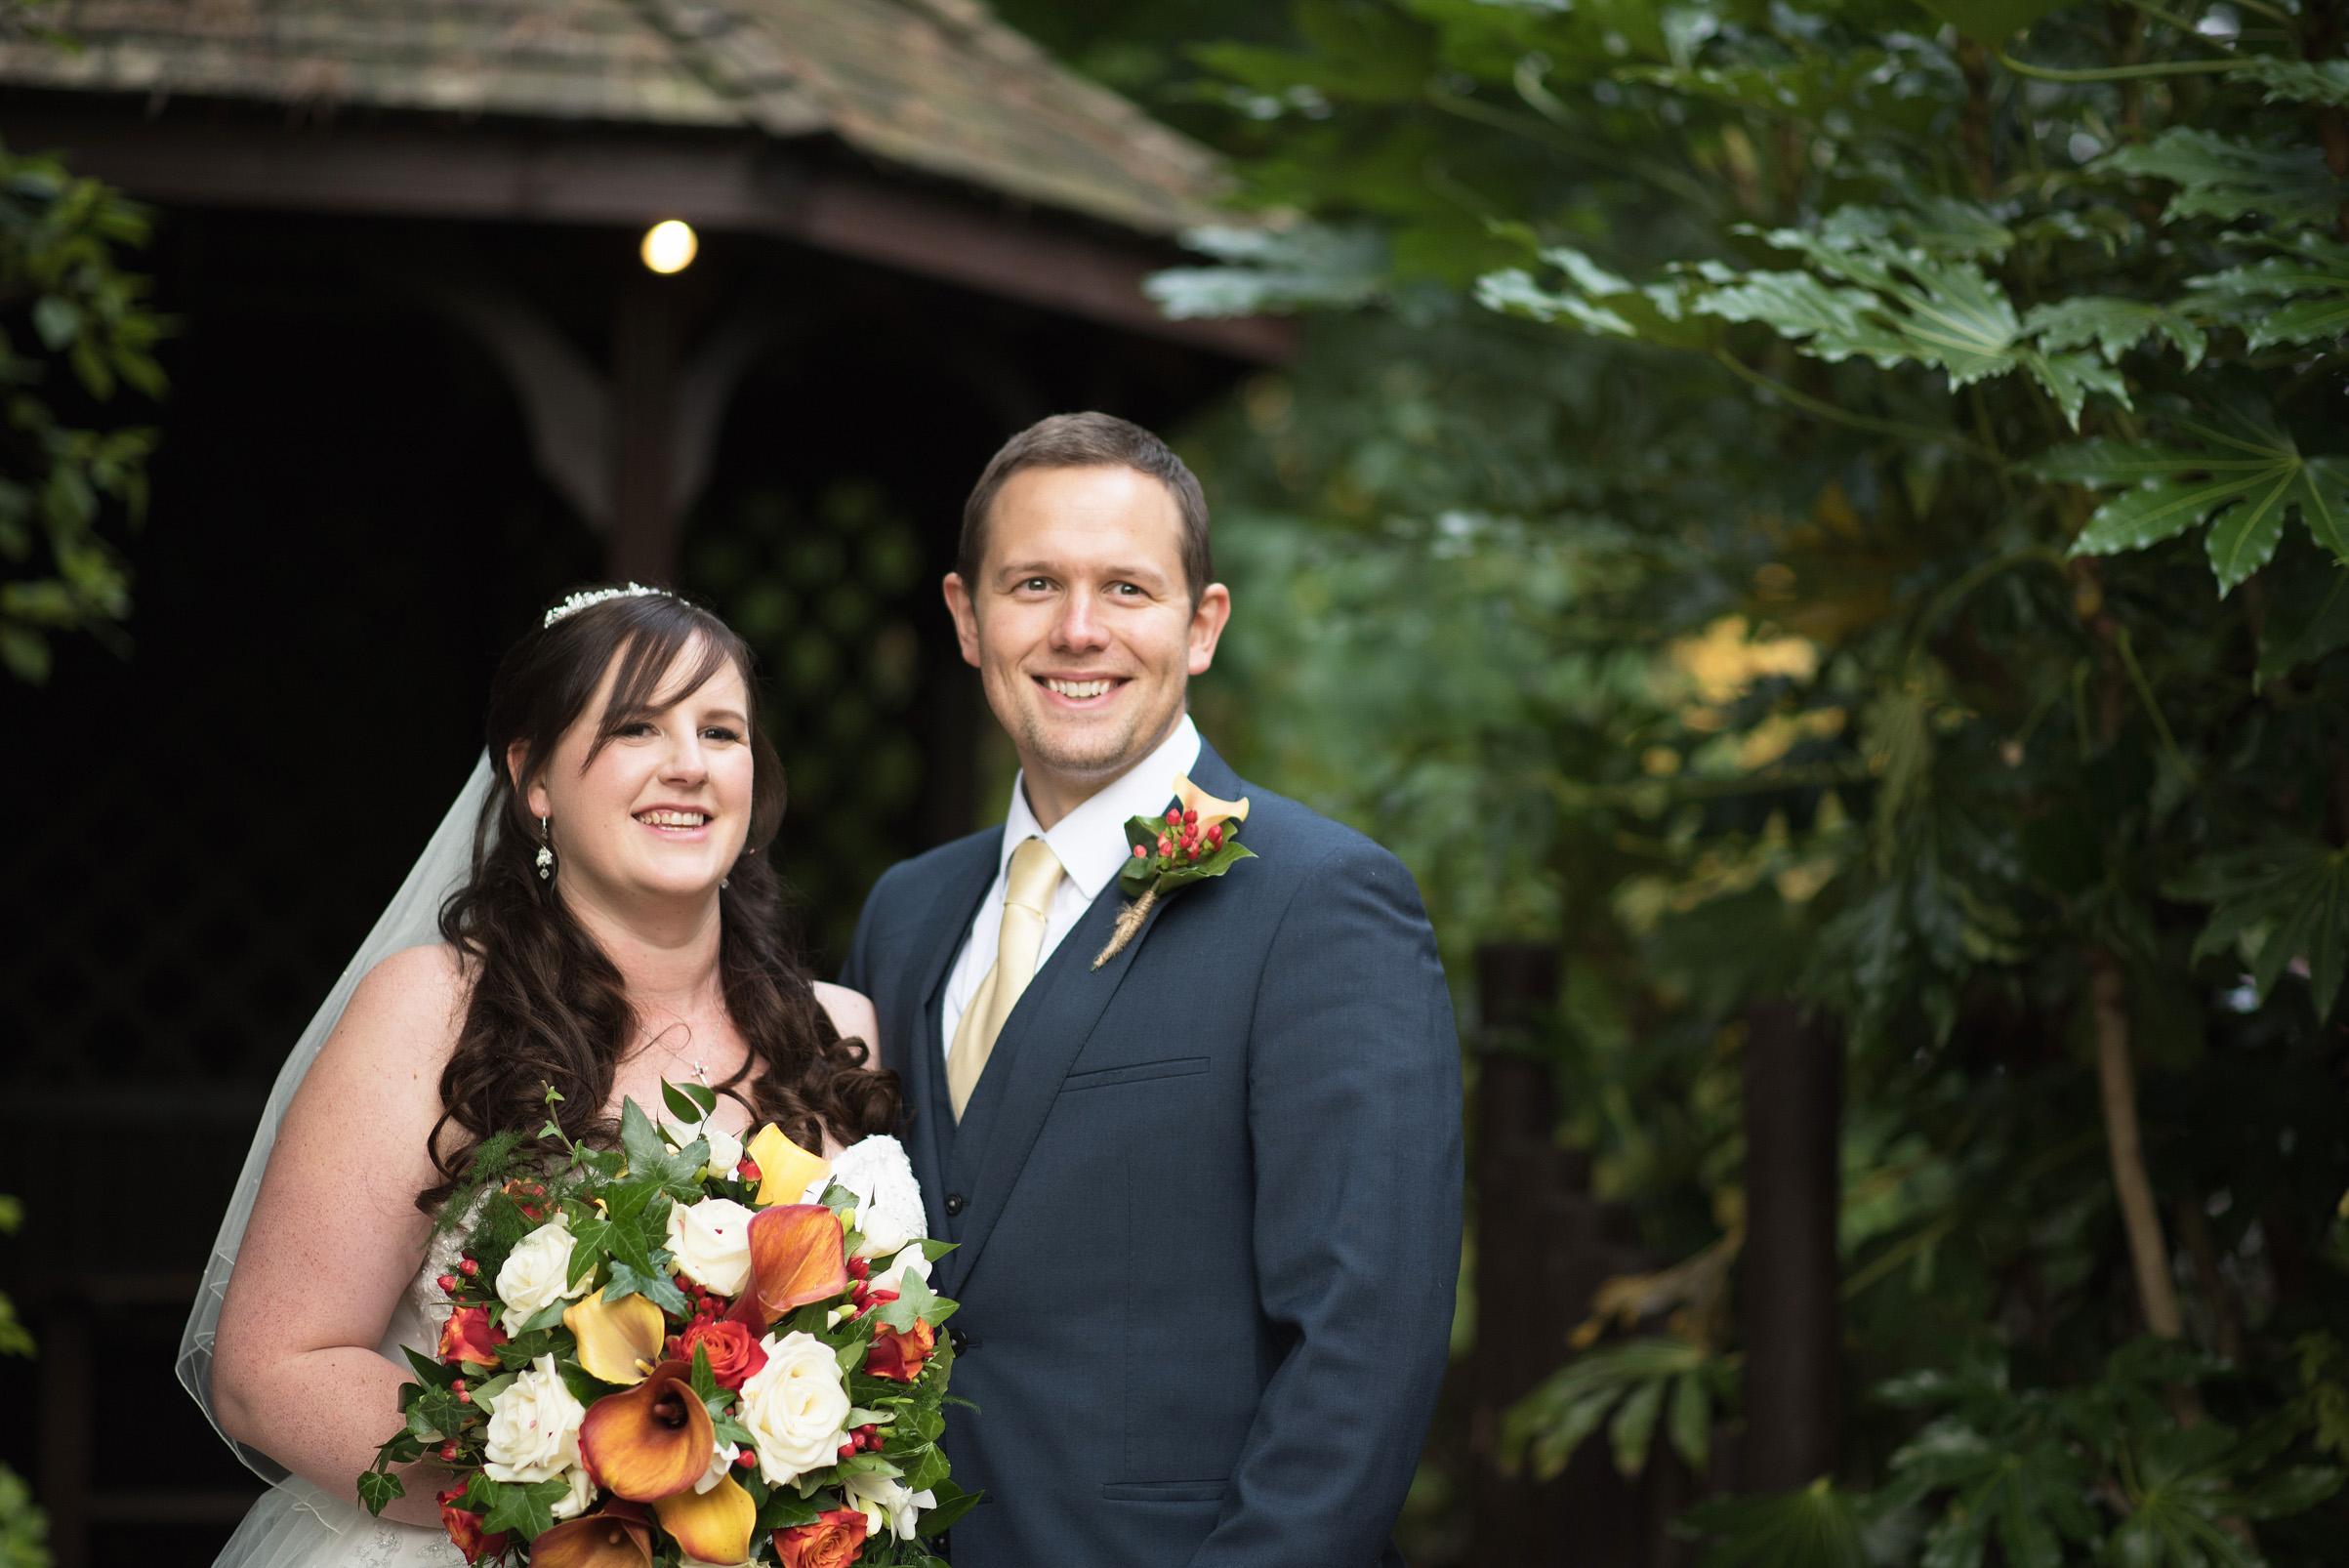 The+Fairlawns+wedding+Aldridge+StLukes+Church-154.jpg